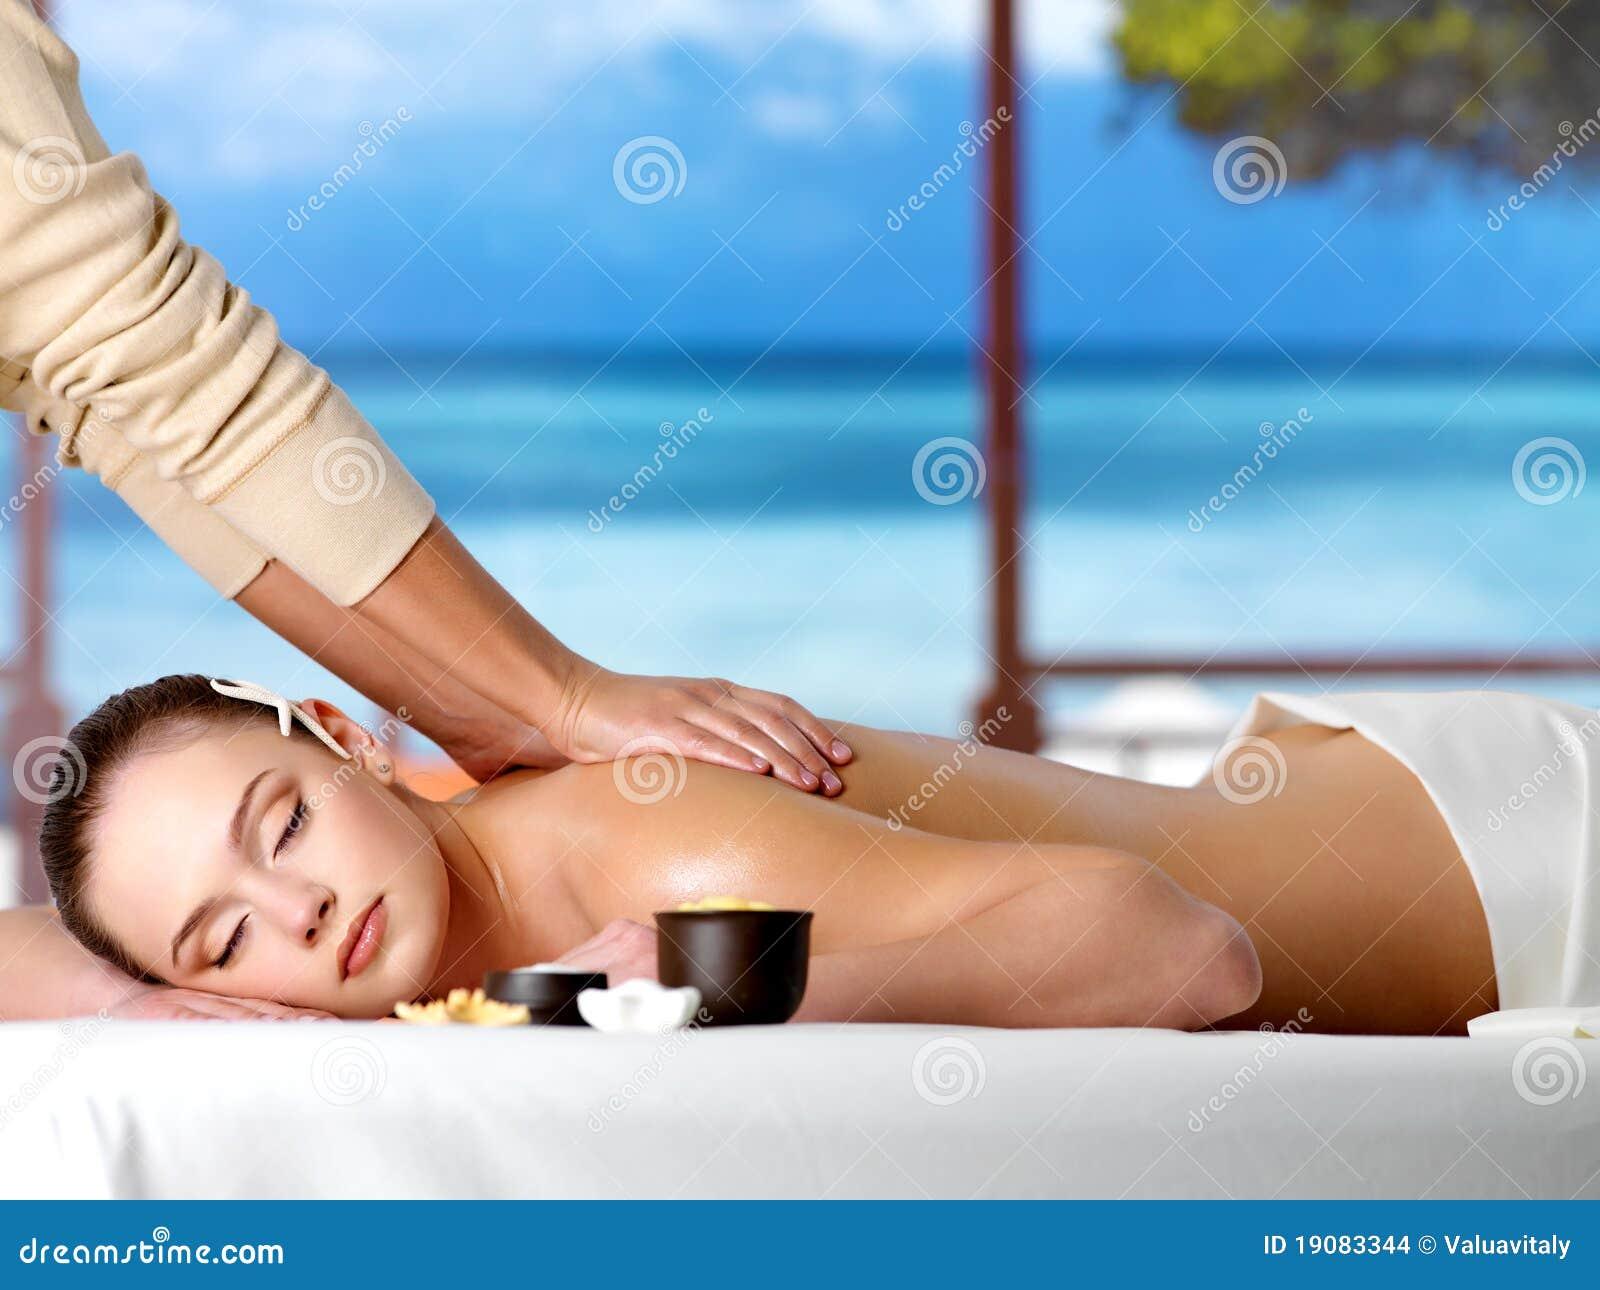 spa and massage en.